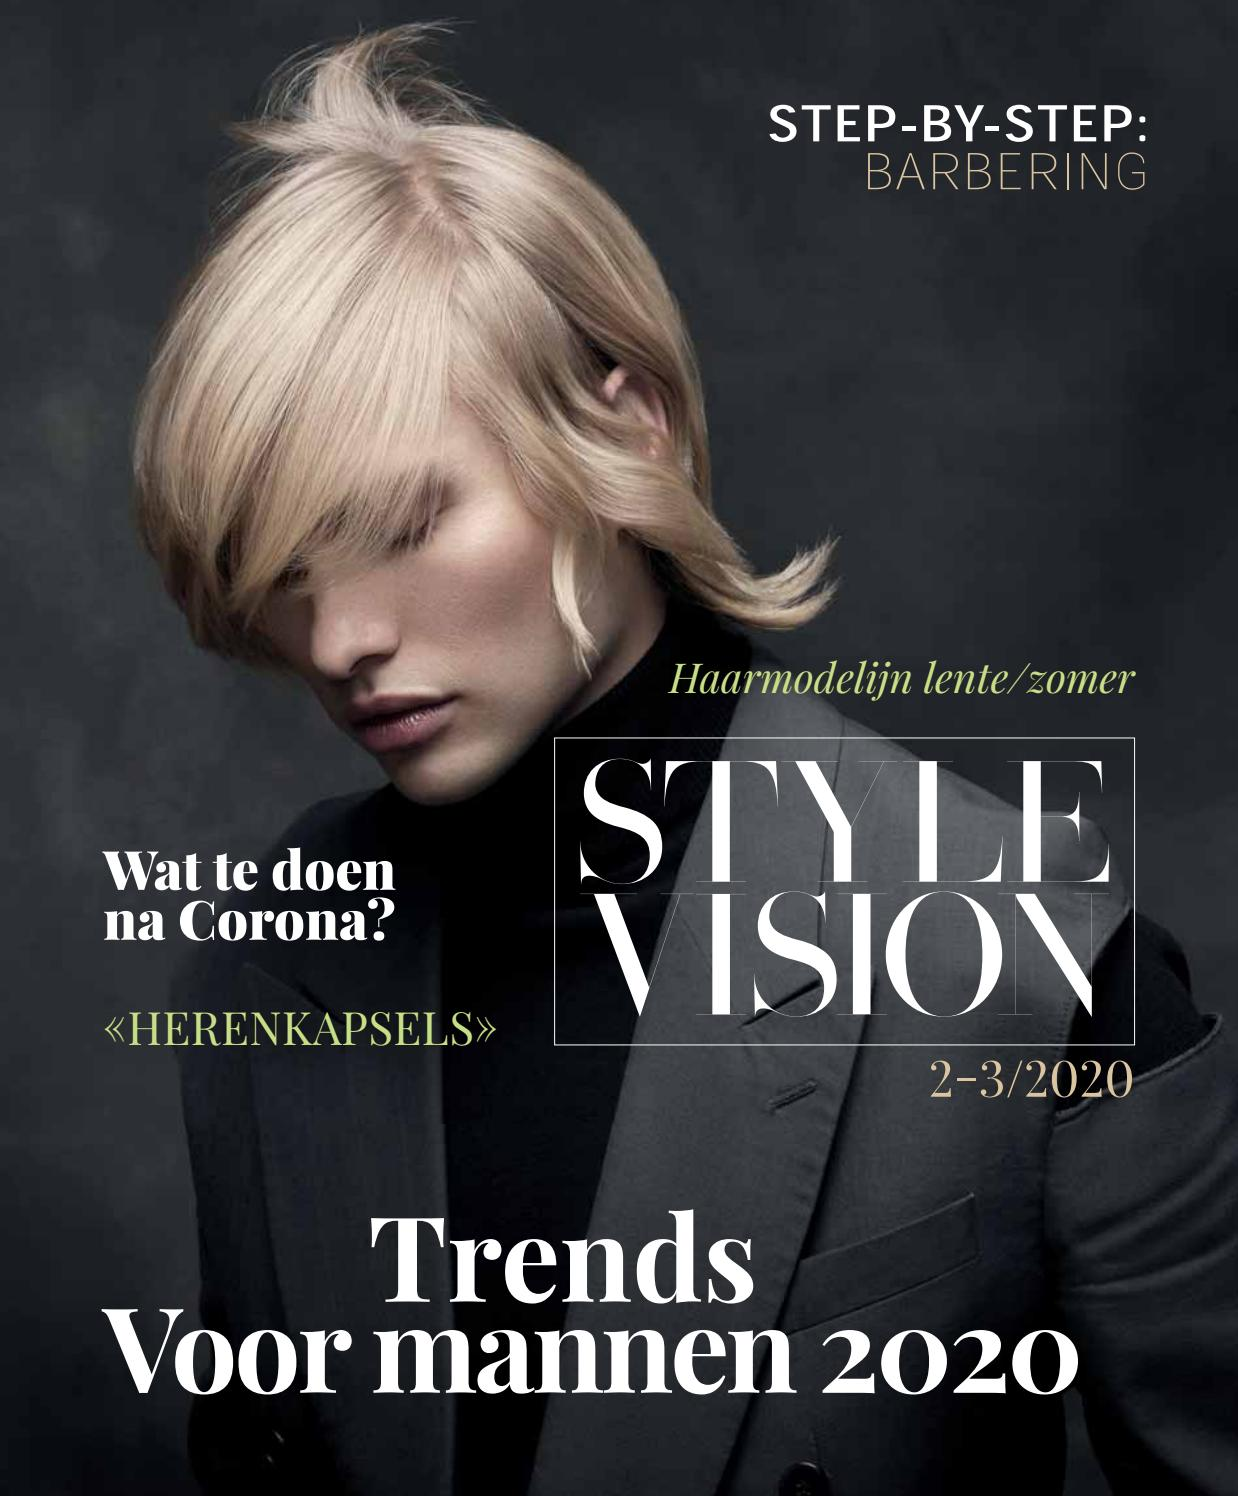 Stylevision Editie 2 3 2020 By Bdu9 Issuu